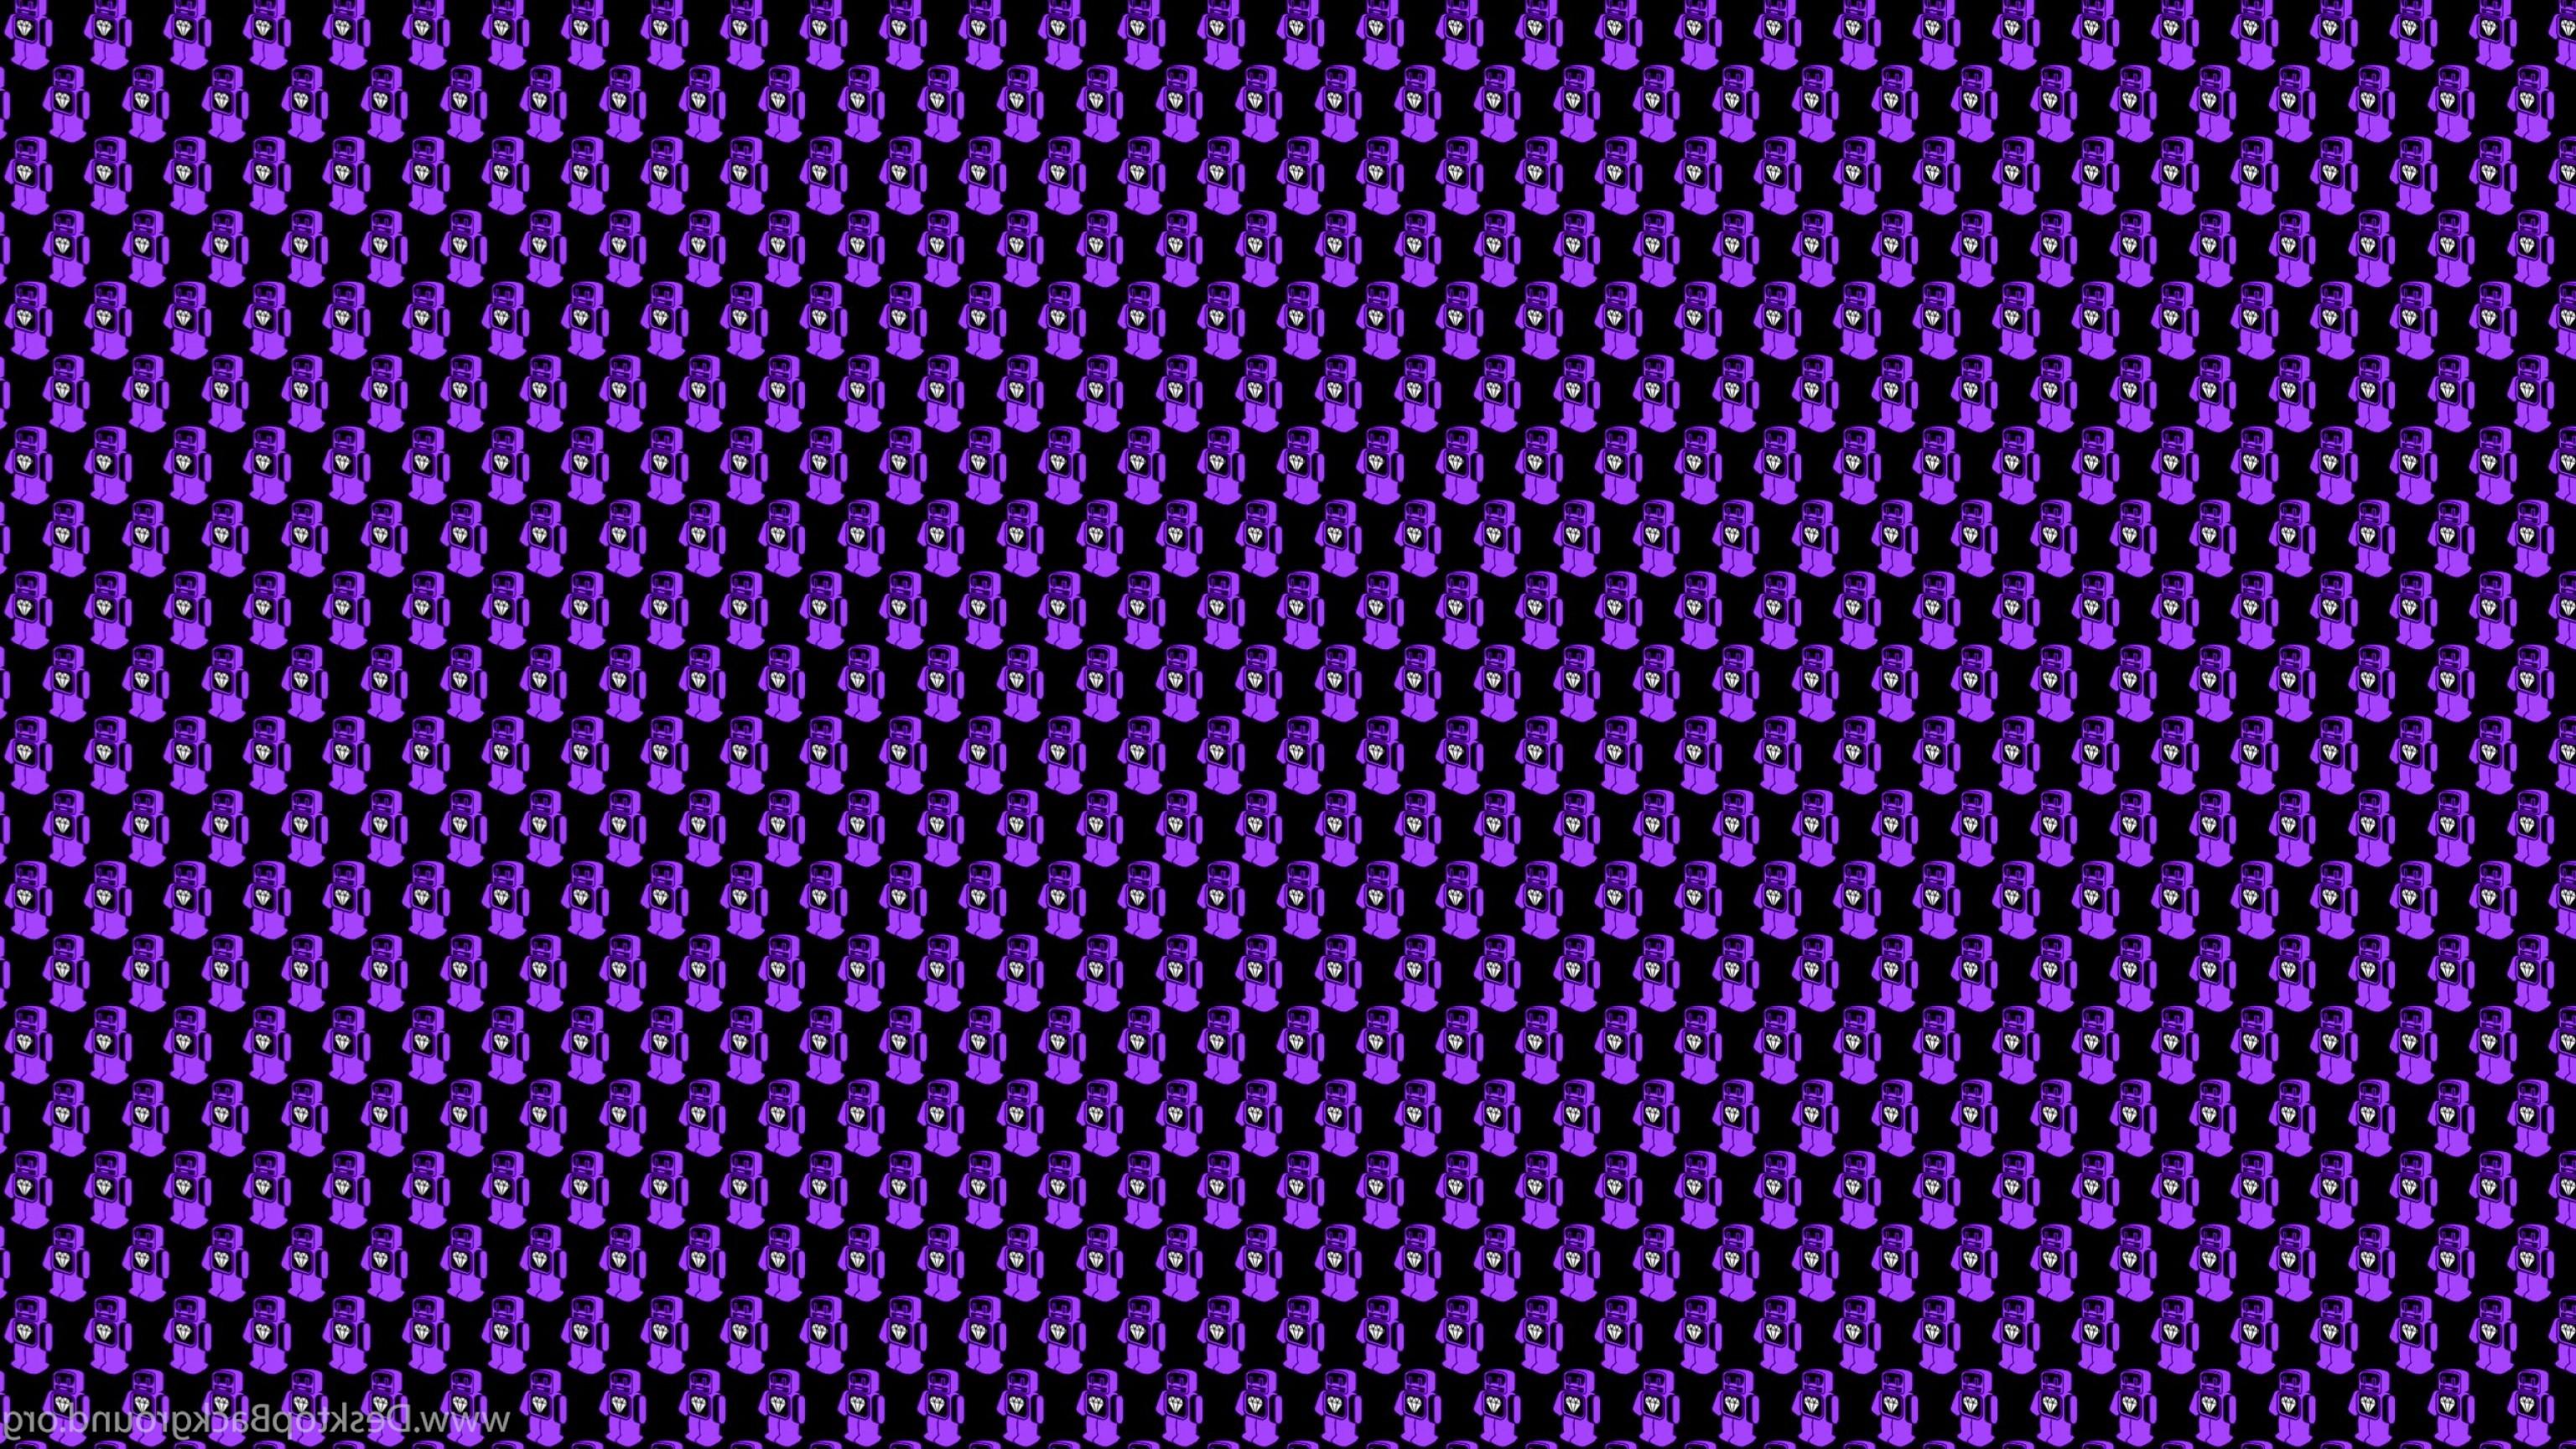 60 Purple Diamond Wallpapers on WallpaperPlay 3072x1728